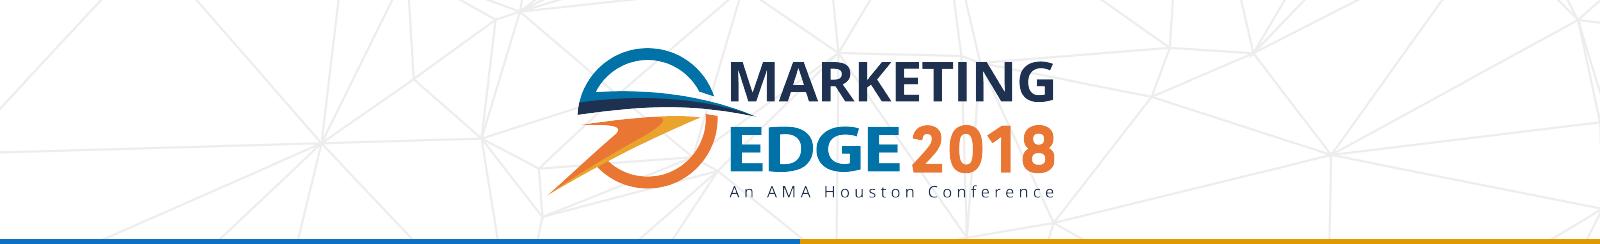 Marketing Edge 2018